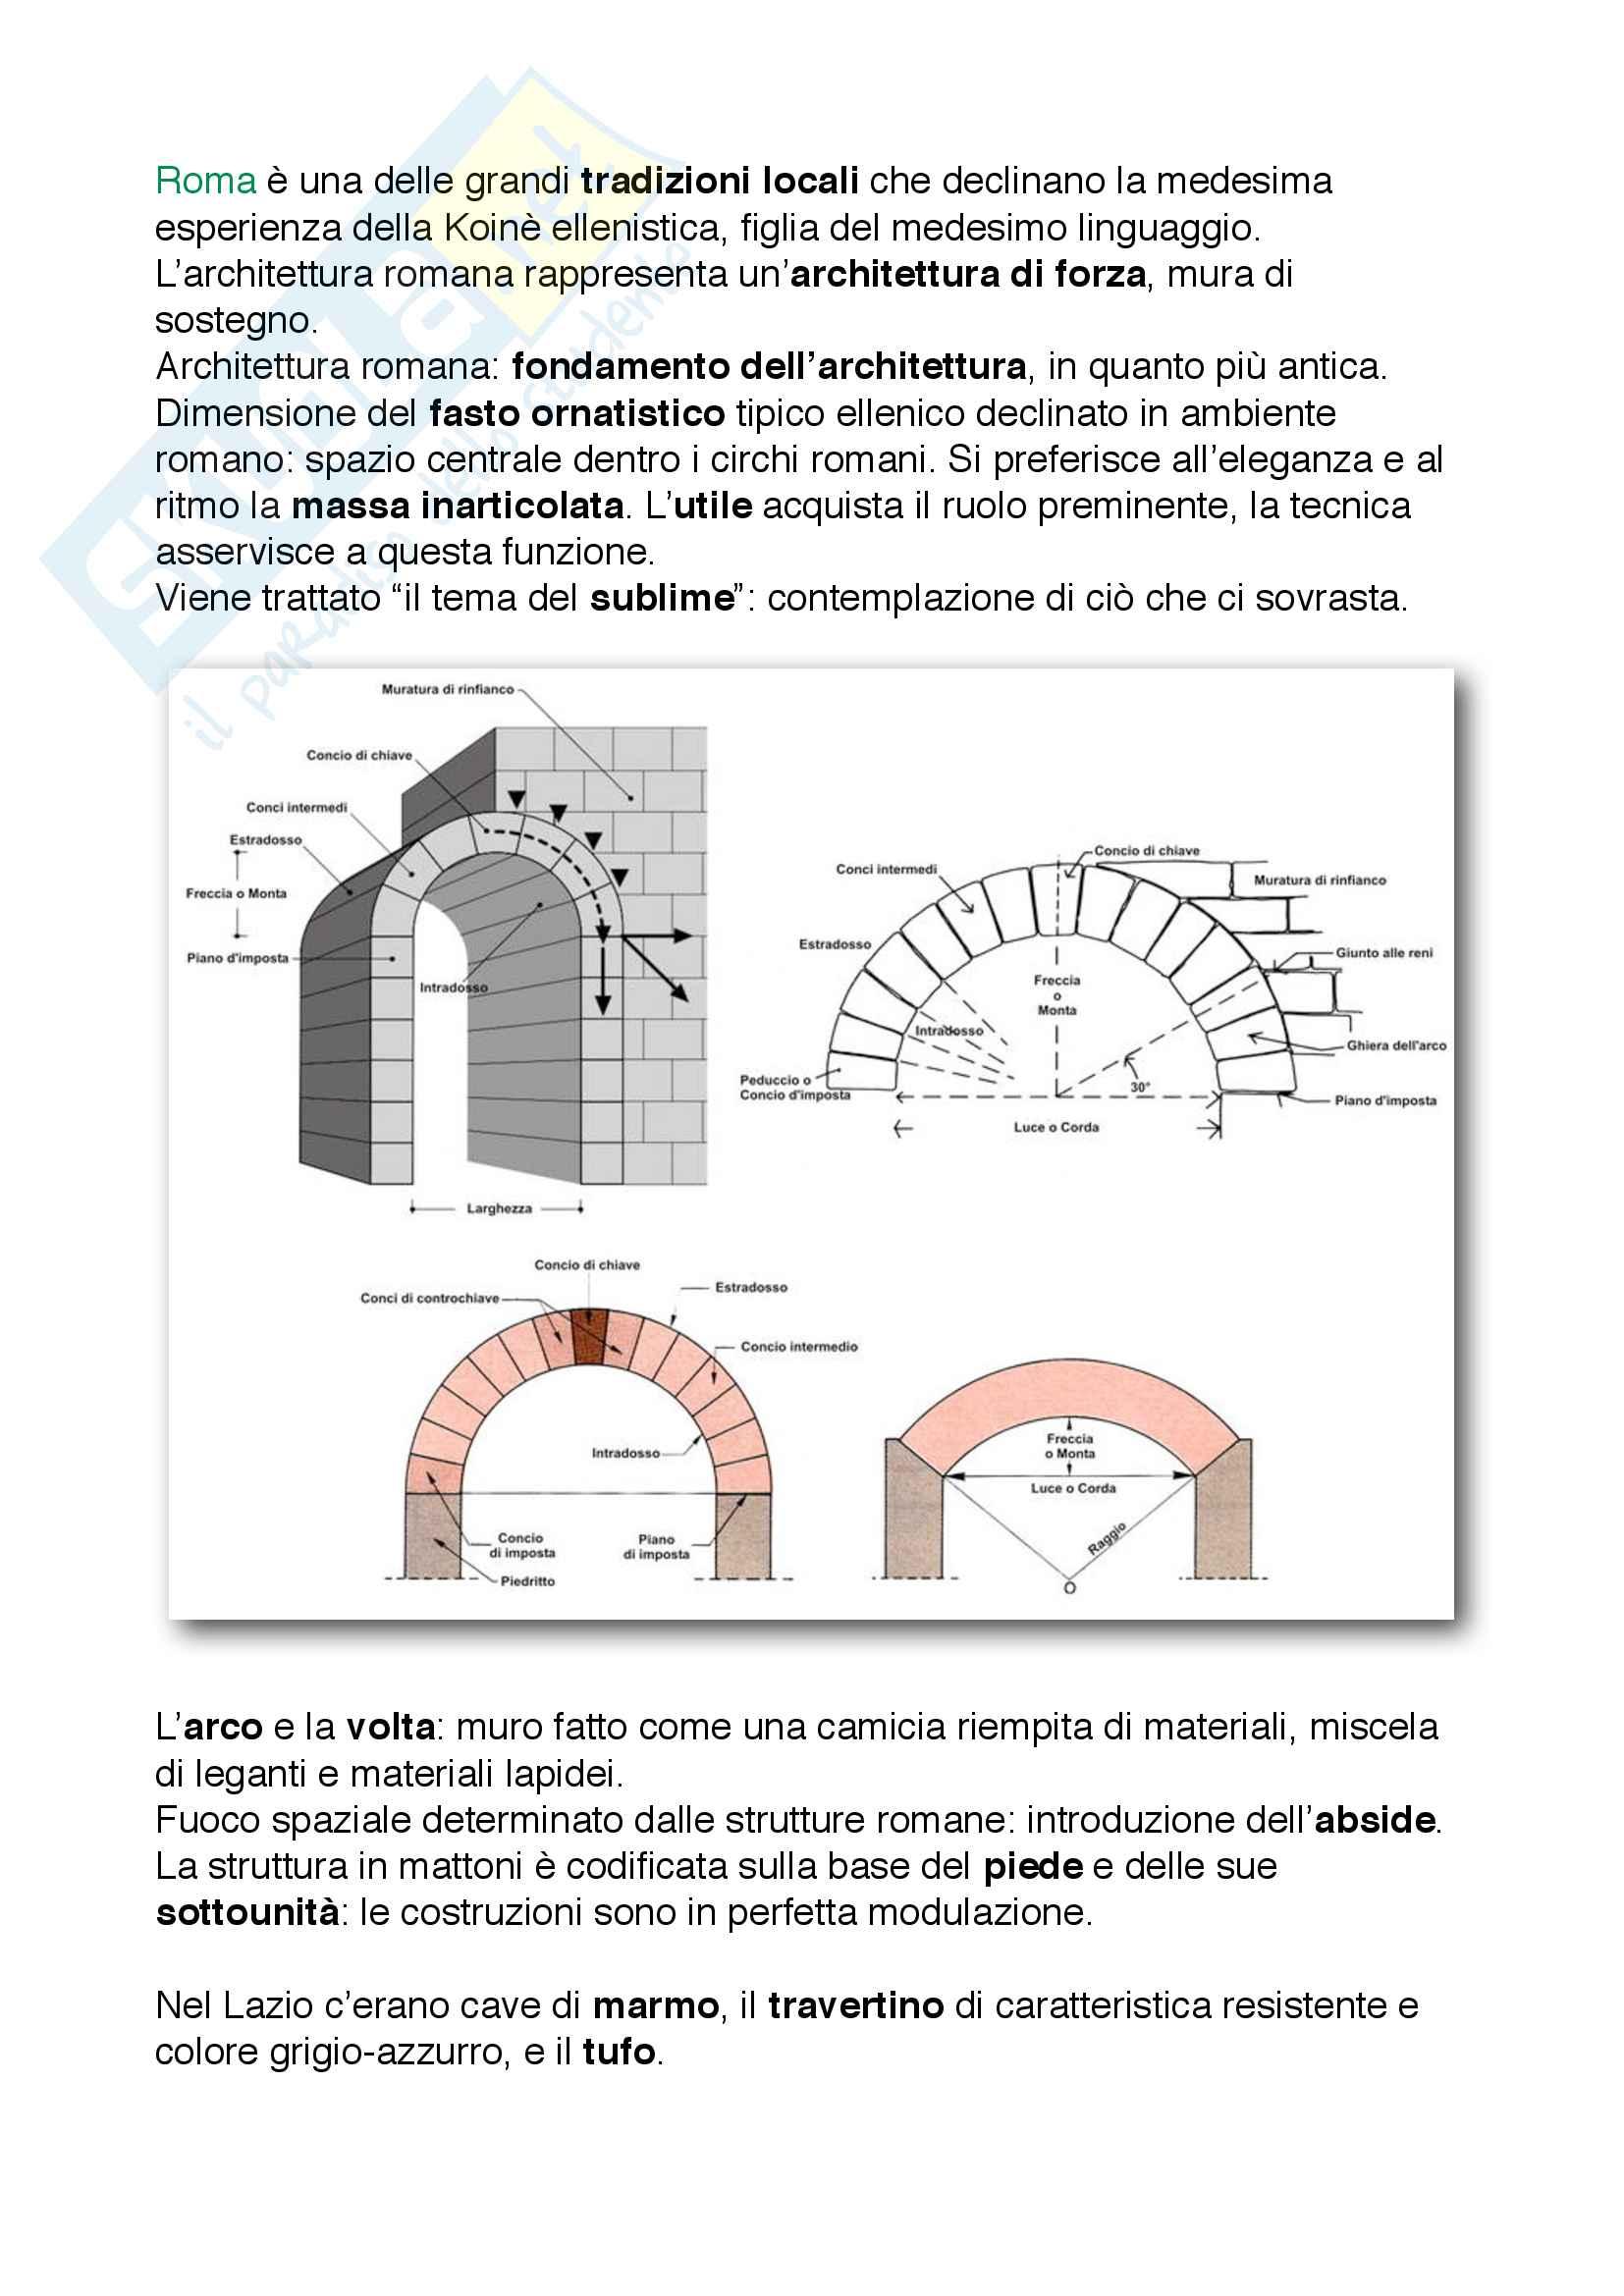 20 L'architettura romana